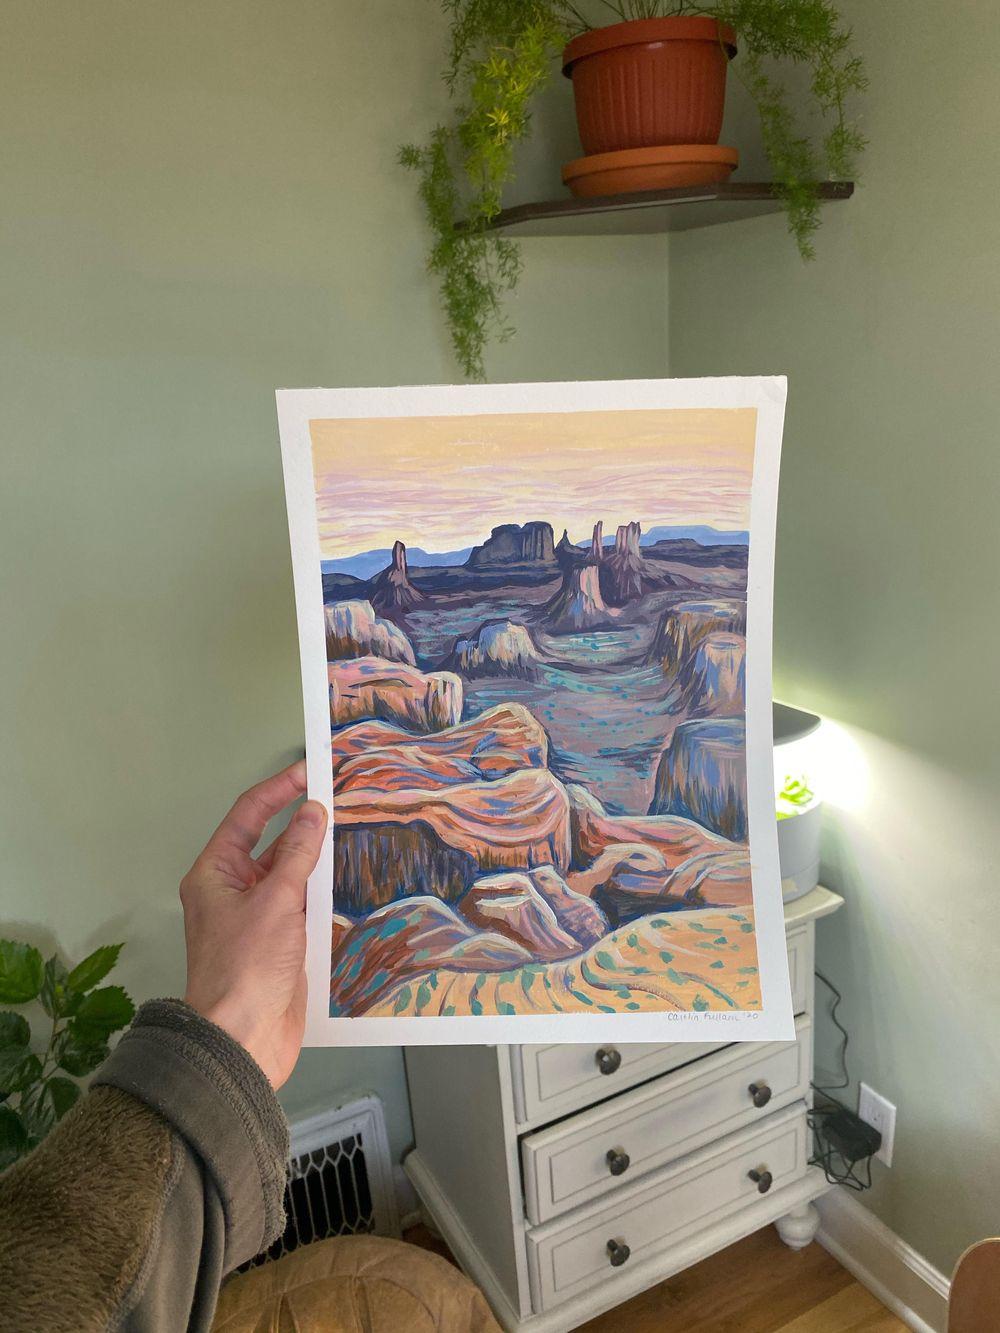 desert vista - image 1 - student project